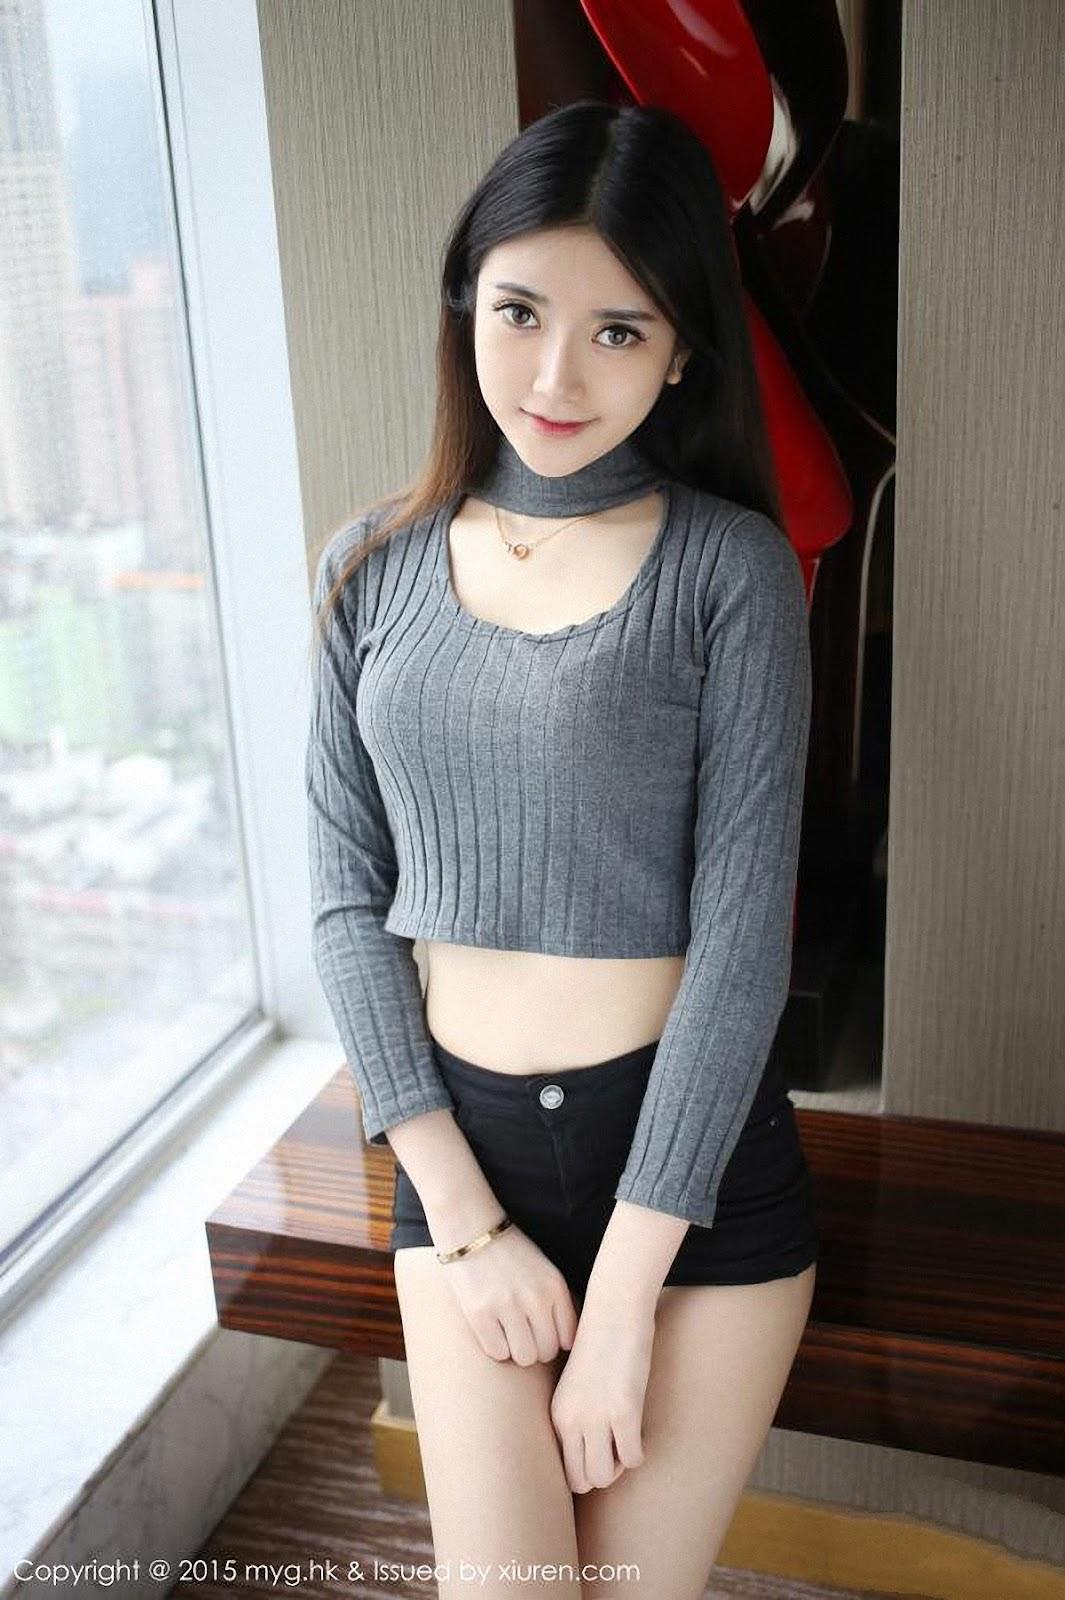 39 - Sexy Girl Model MYGIRL VOL.119